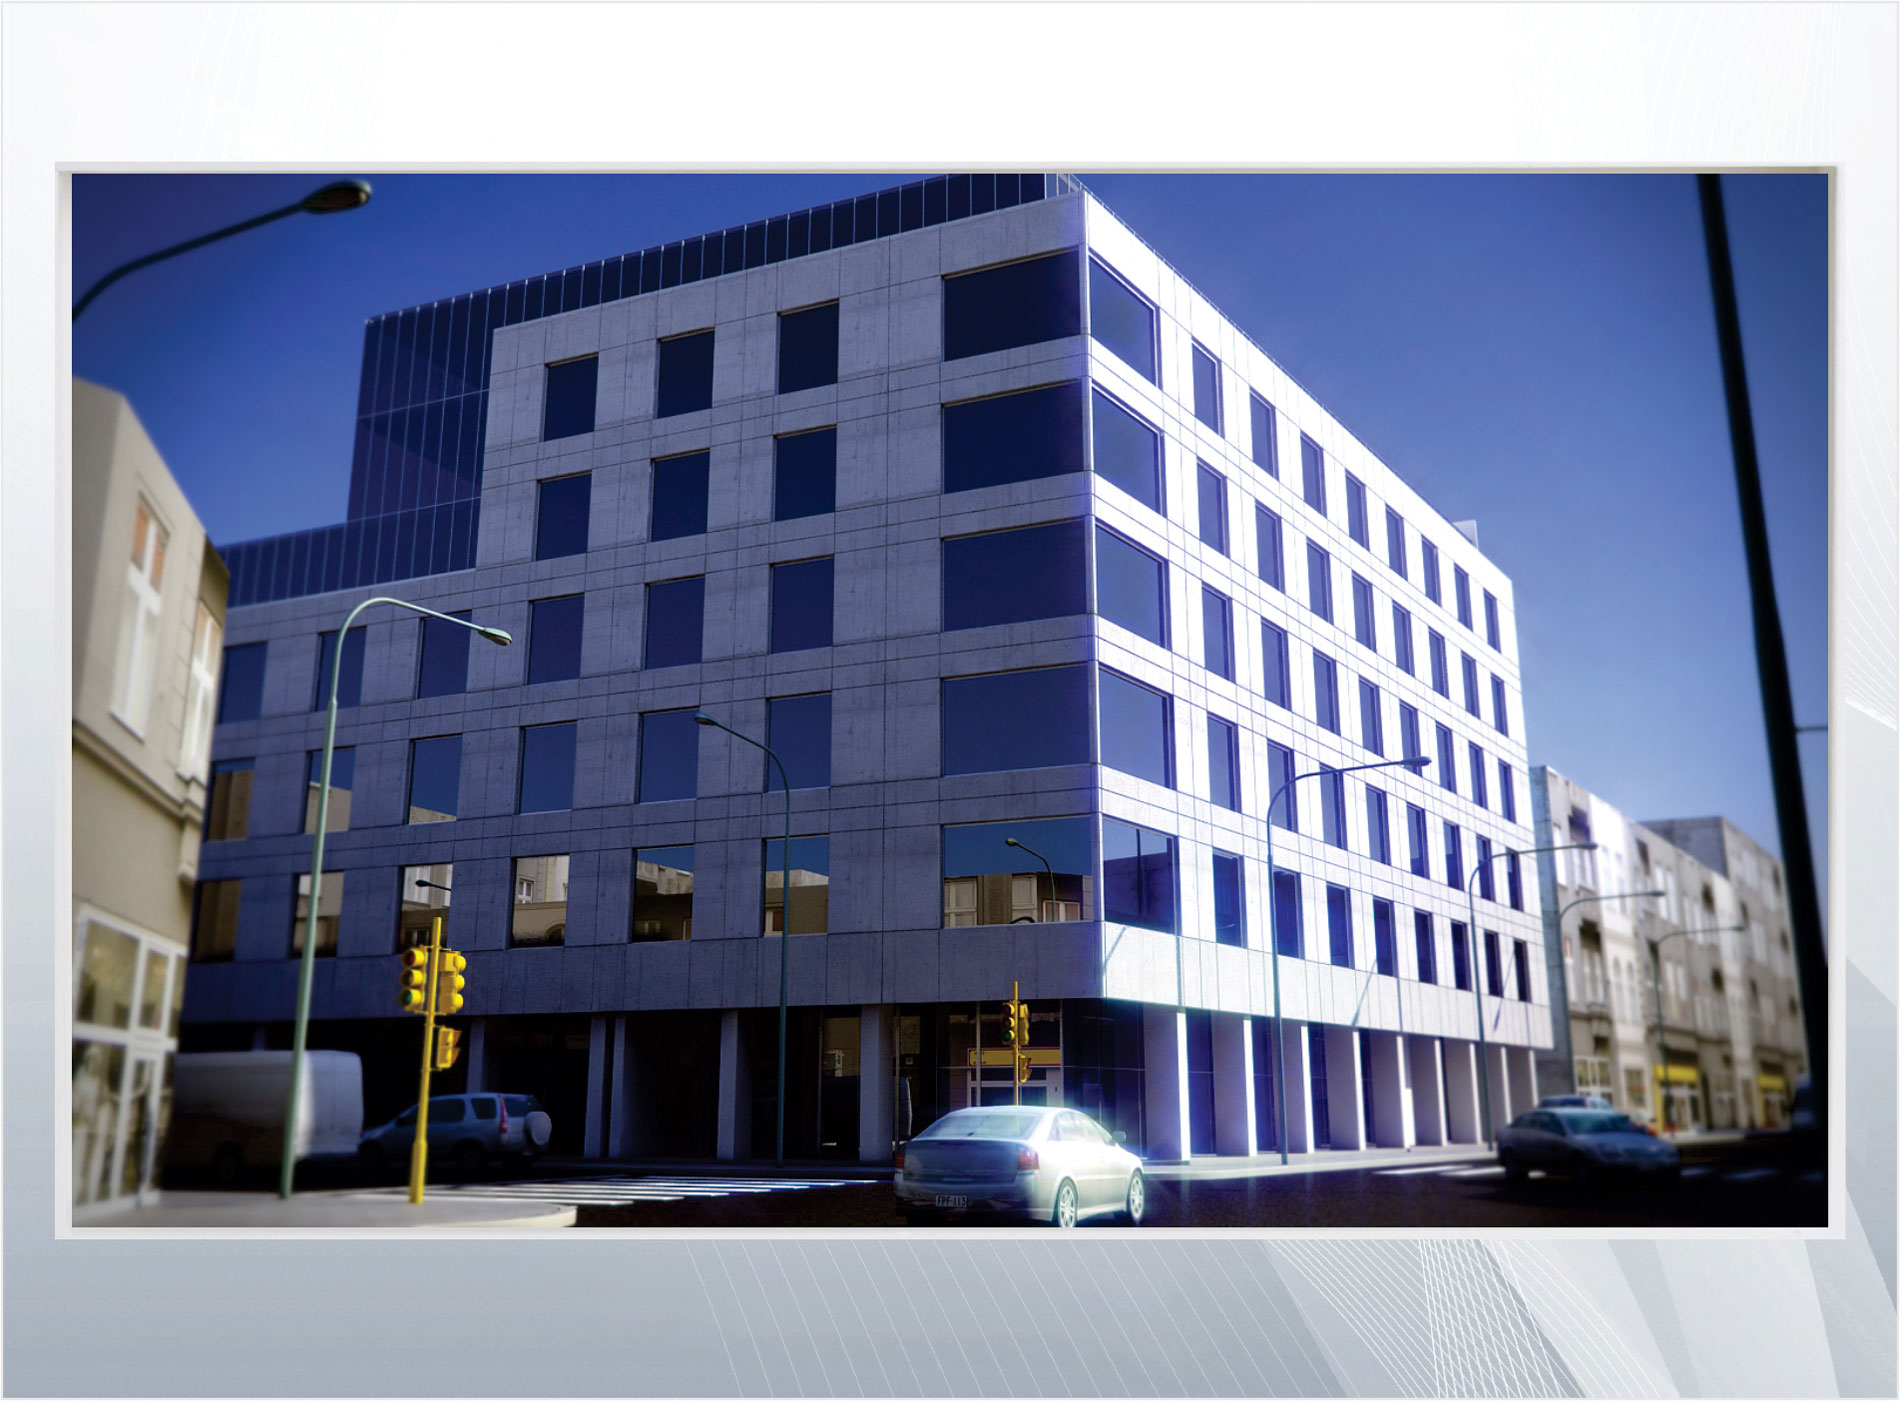 79_render_fachada_edificio_ggcm